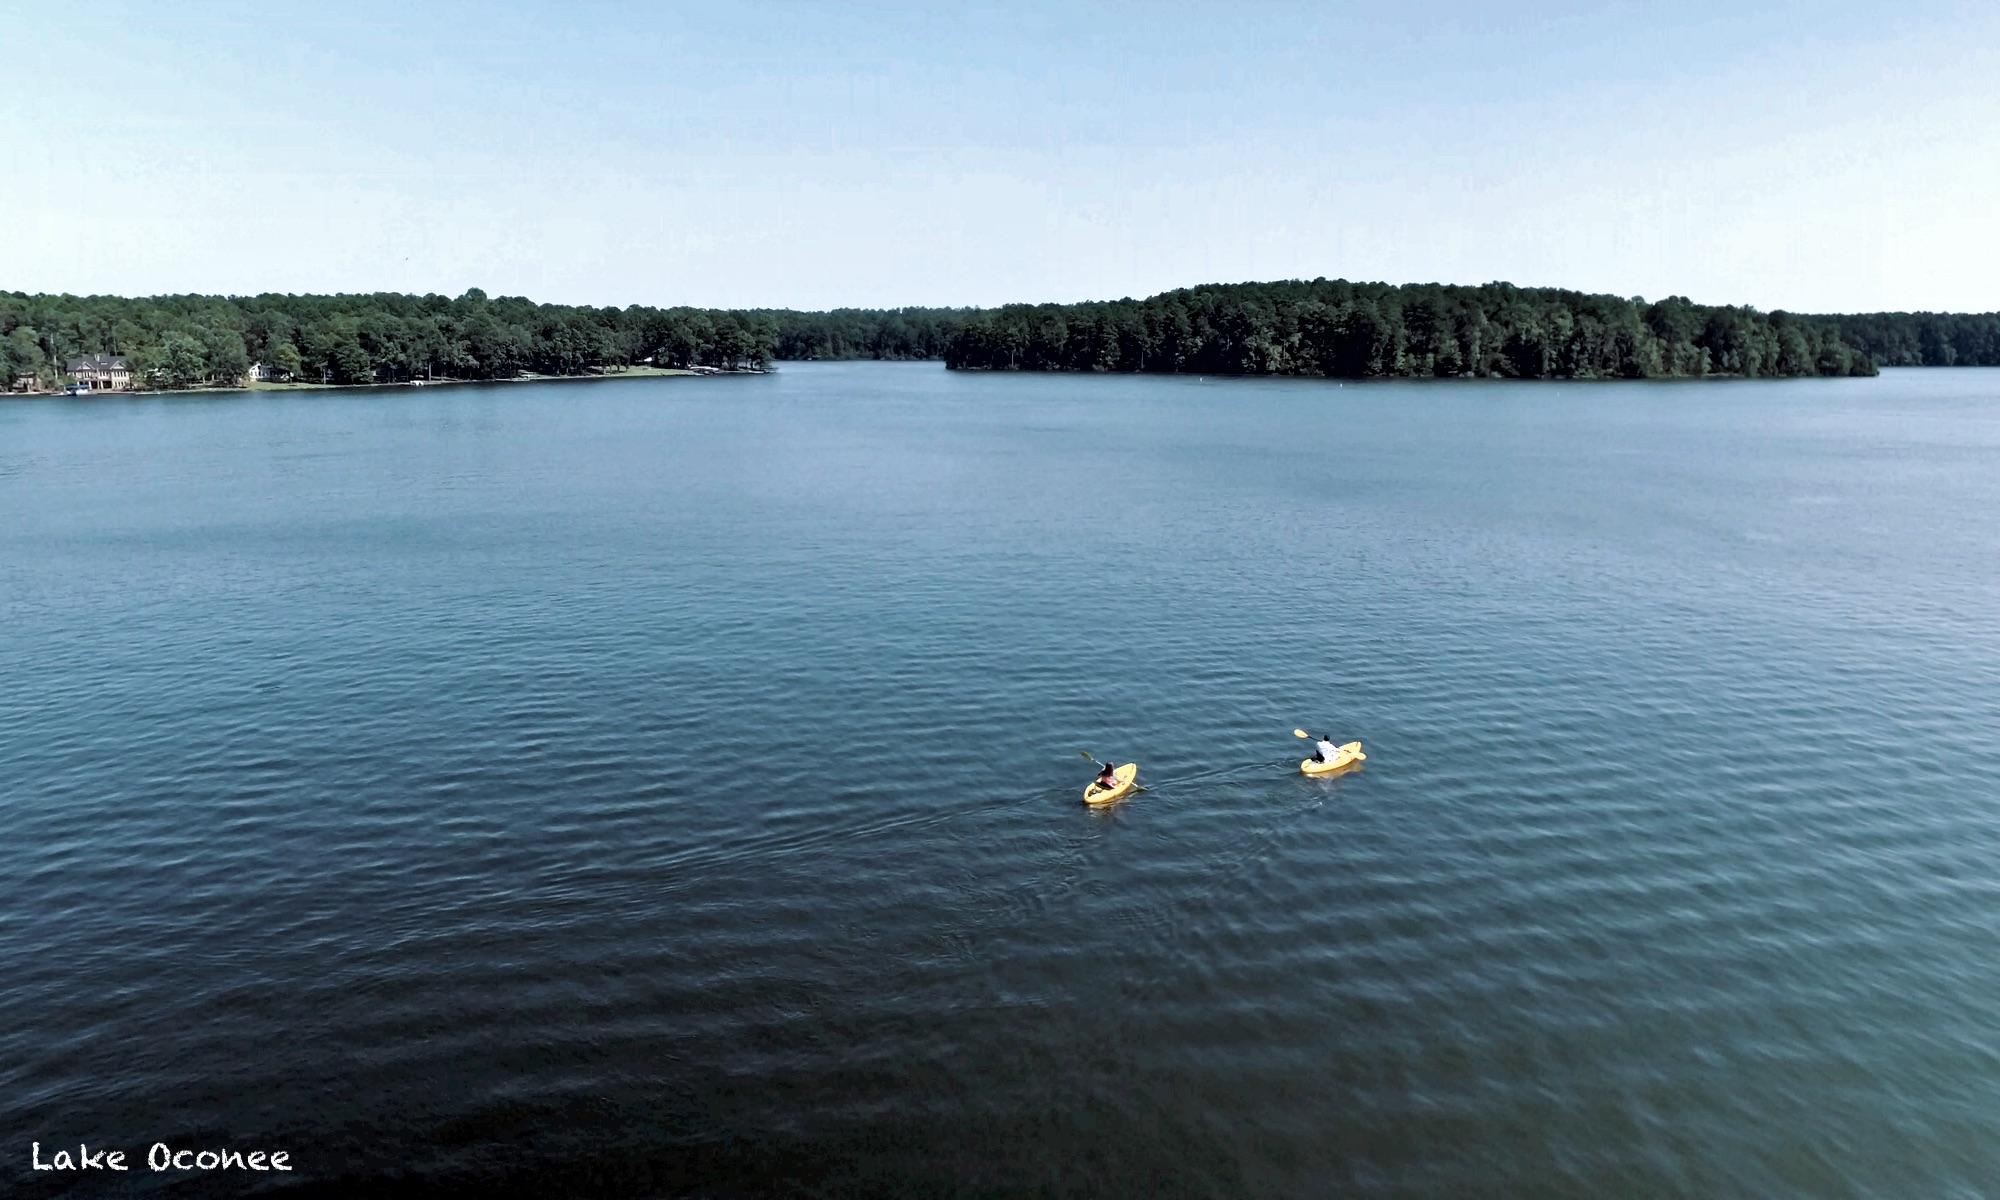 Lake oconee attractions ritz carlton reynolds low for Lake oconee fishing